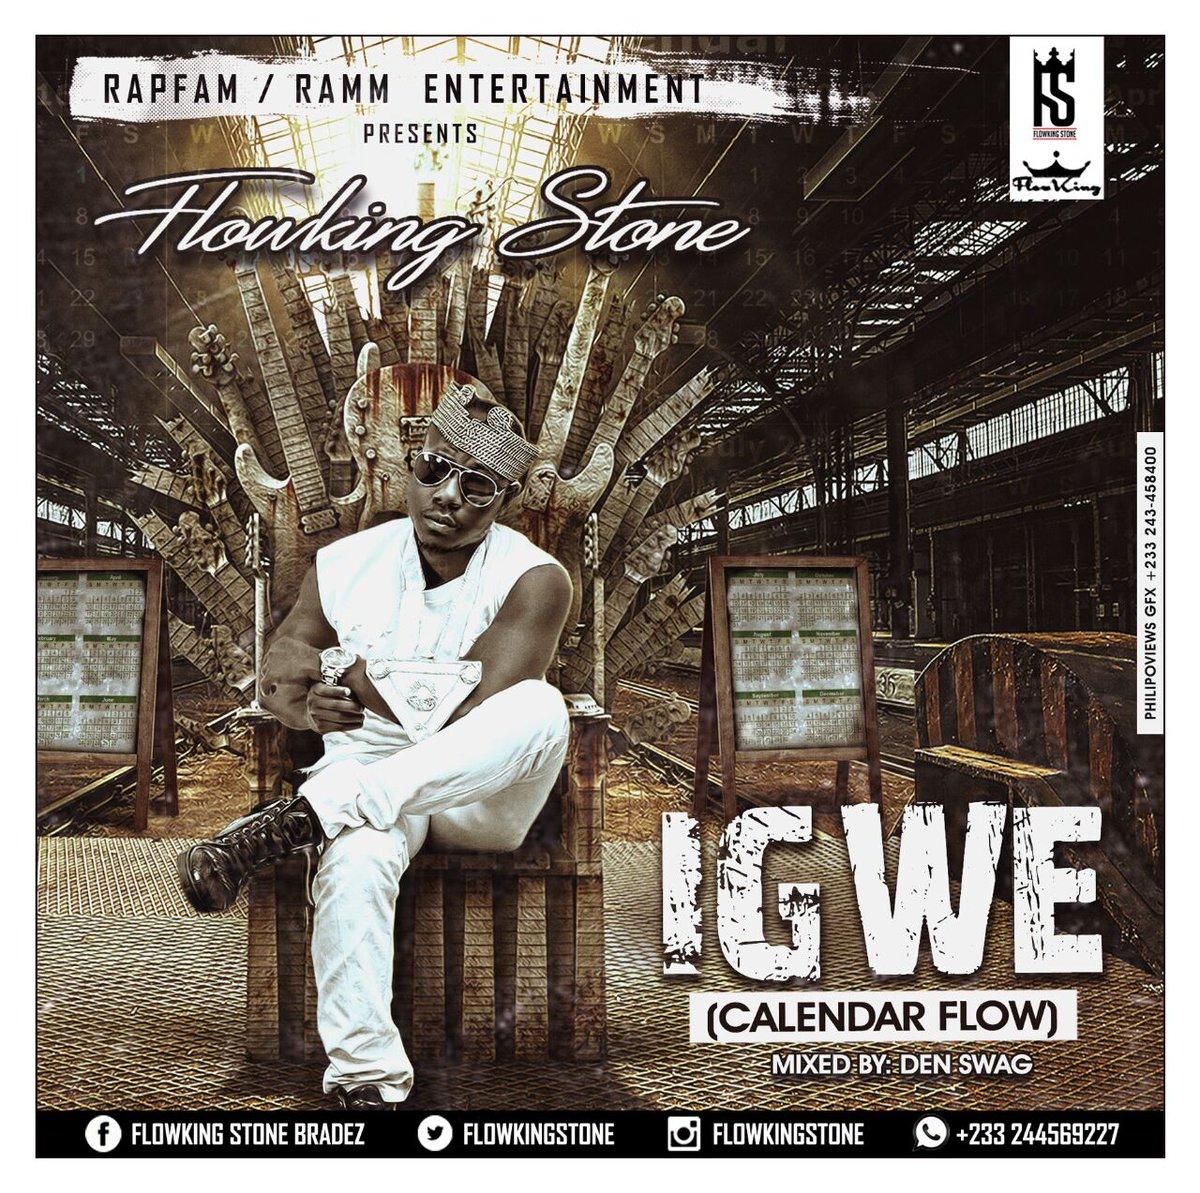 #igwe dropping on Friday. https://t.co/kRIy3AlPOn